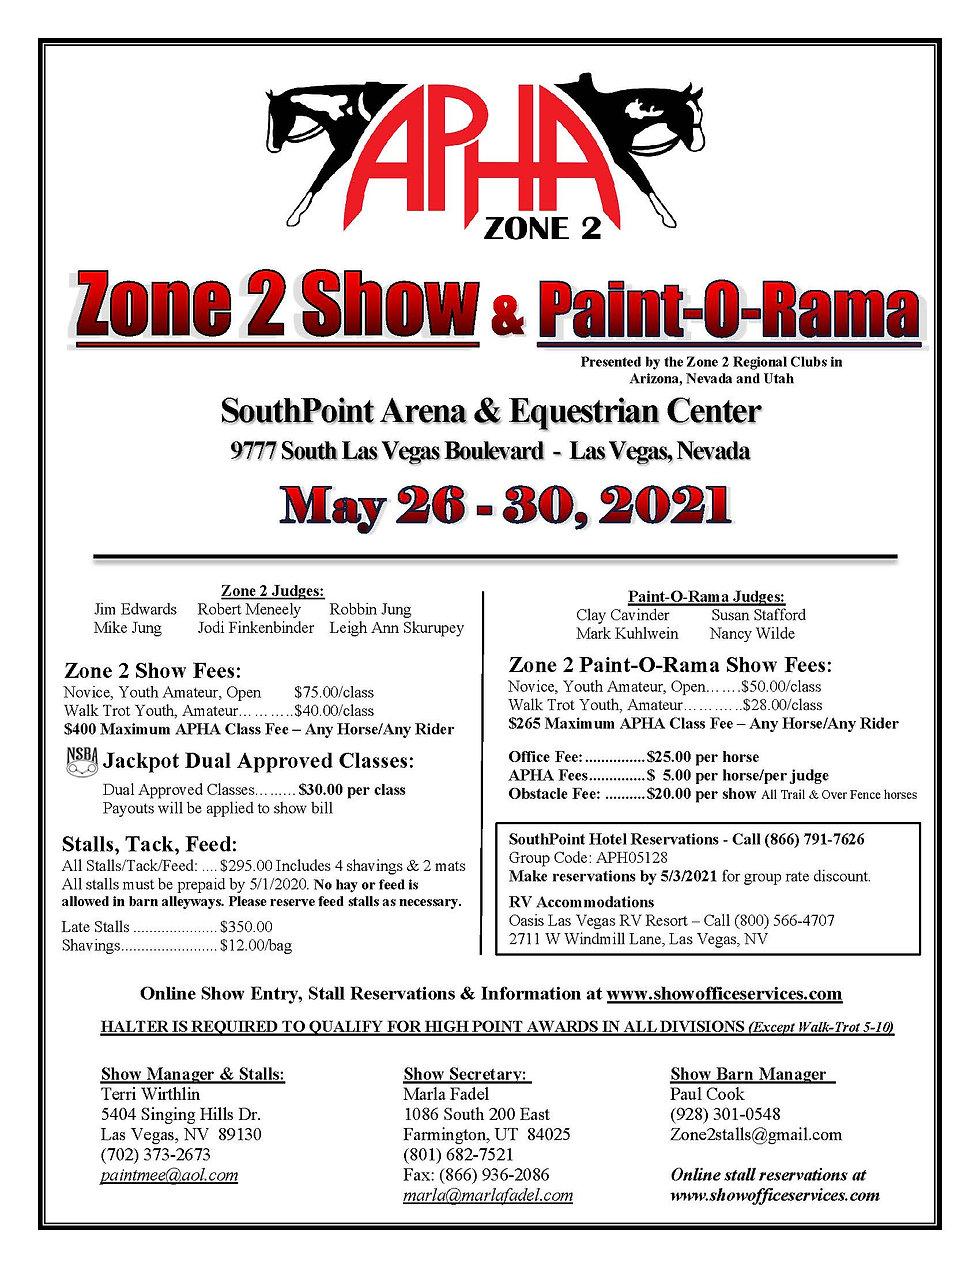 Zone 2 UPHC Showbill 2021.jpg